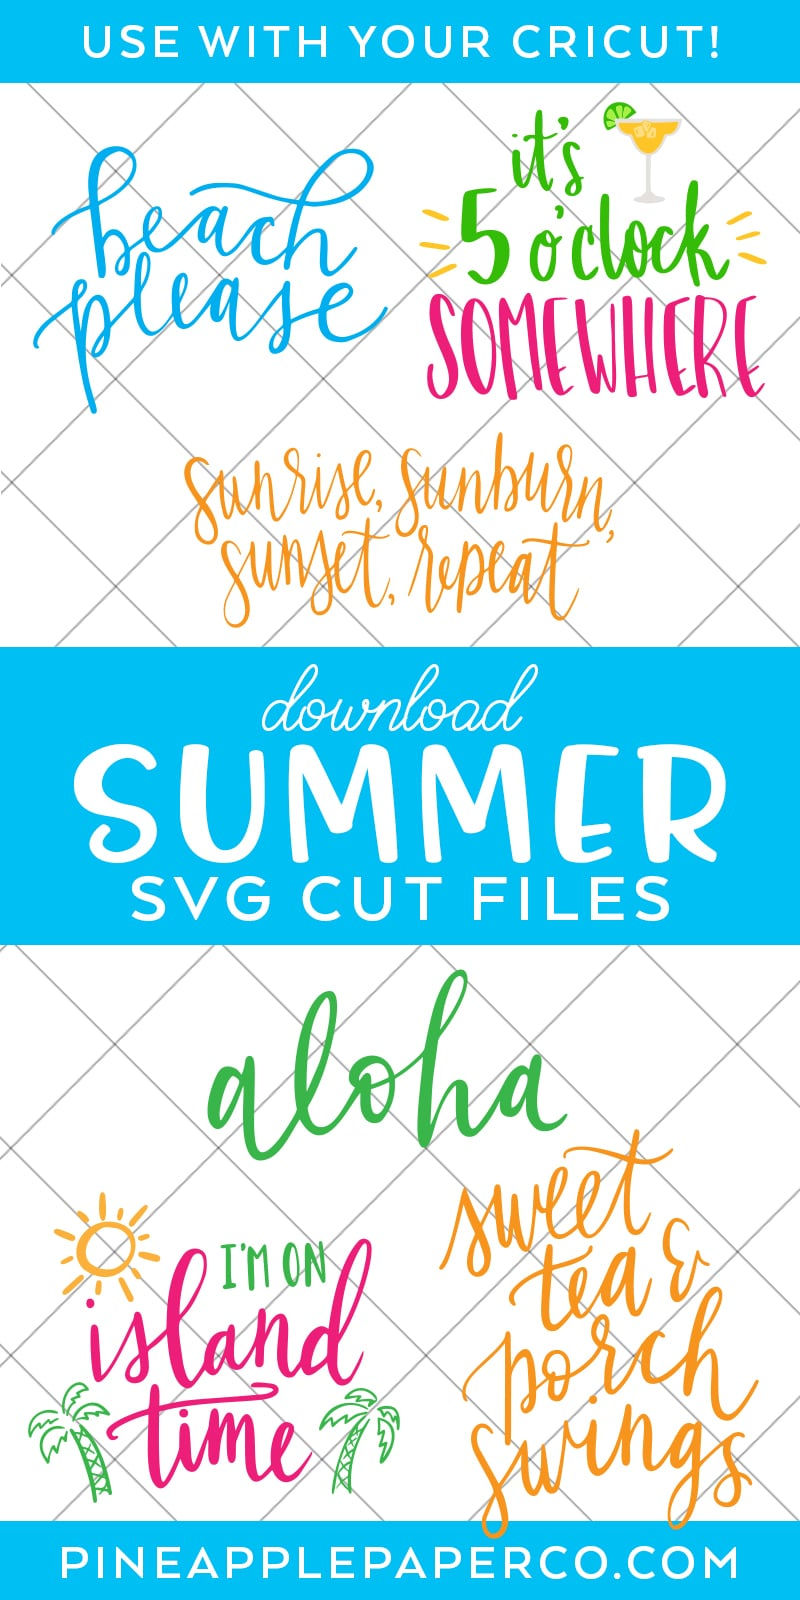 Summer Is So Sweet Svg Printable Image Cricut Summer Svg Sunglasses Svg Silhouette Pineapple svg T Shirt Design Svg Cut File for